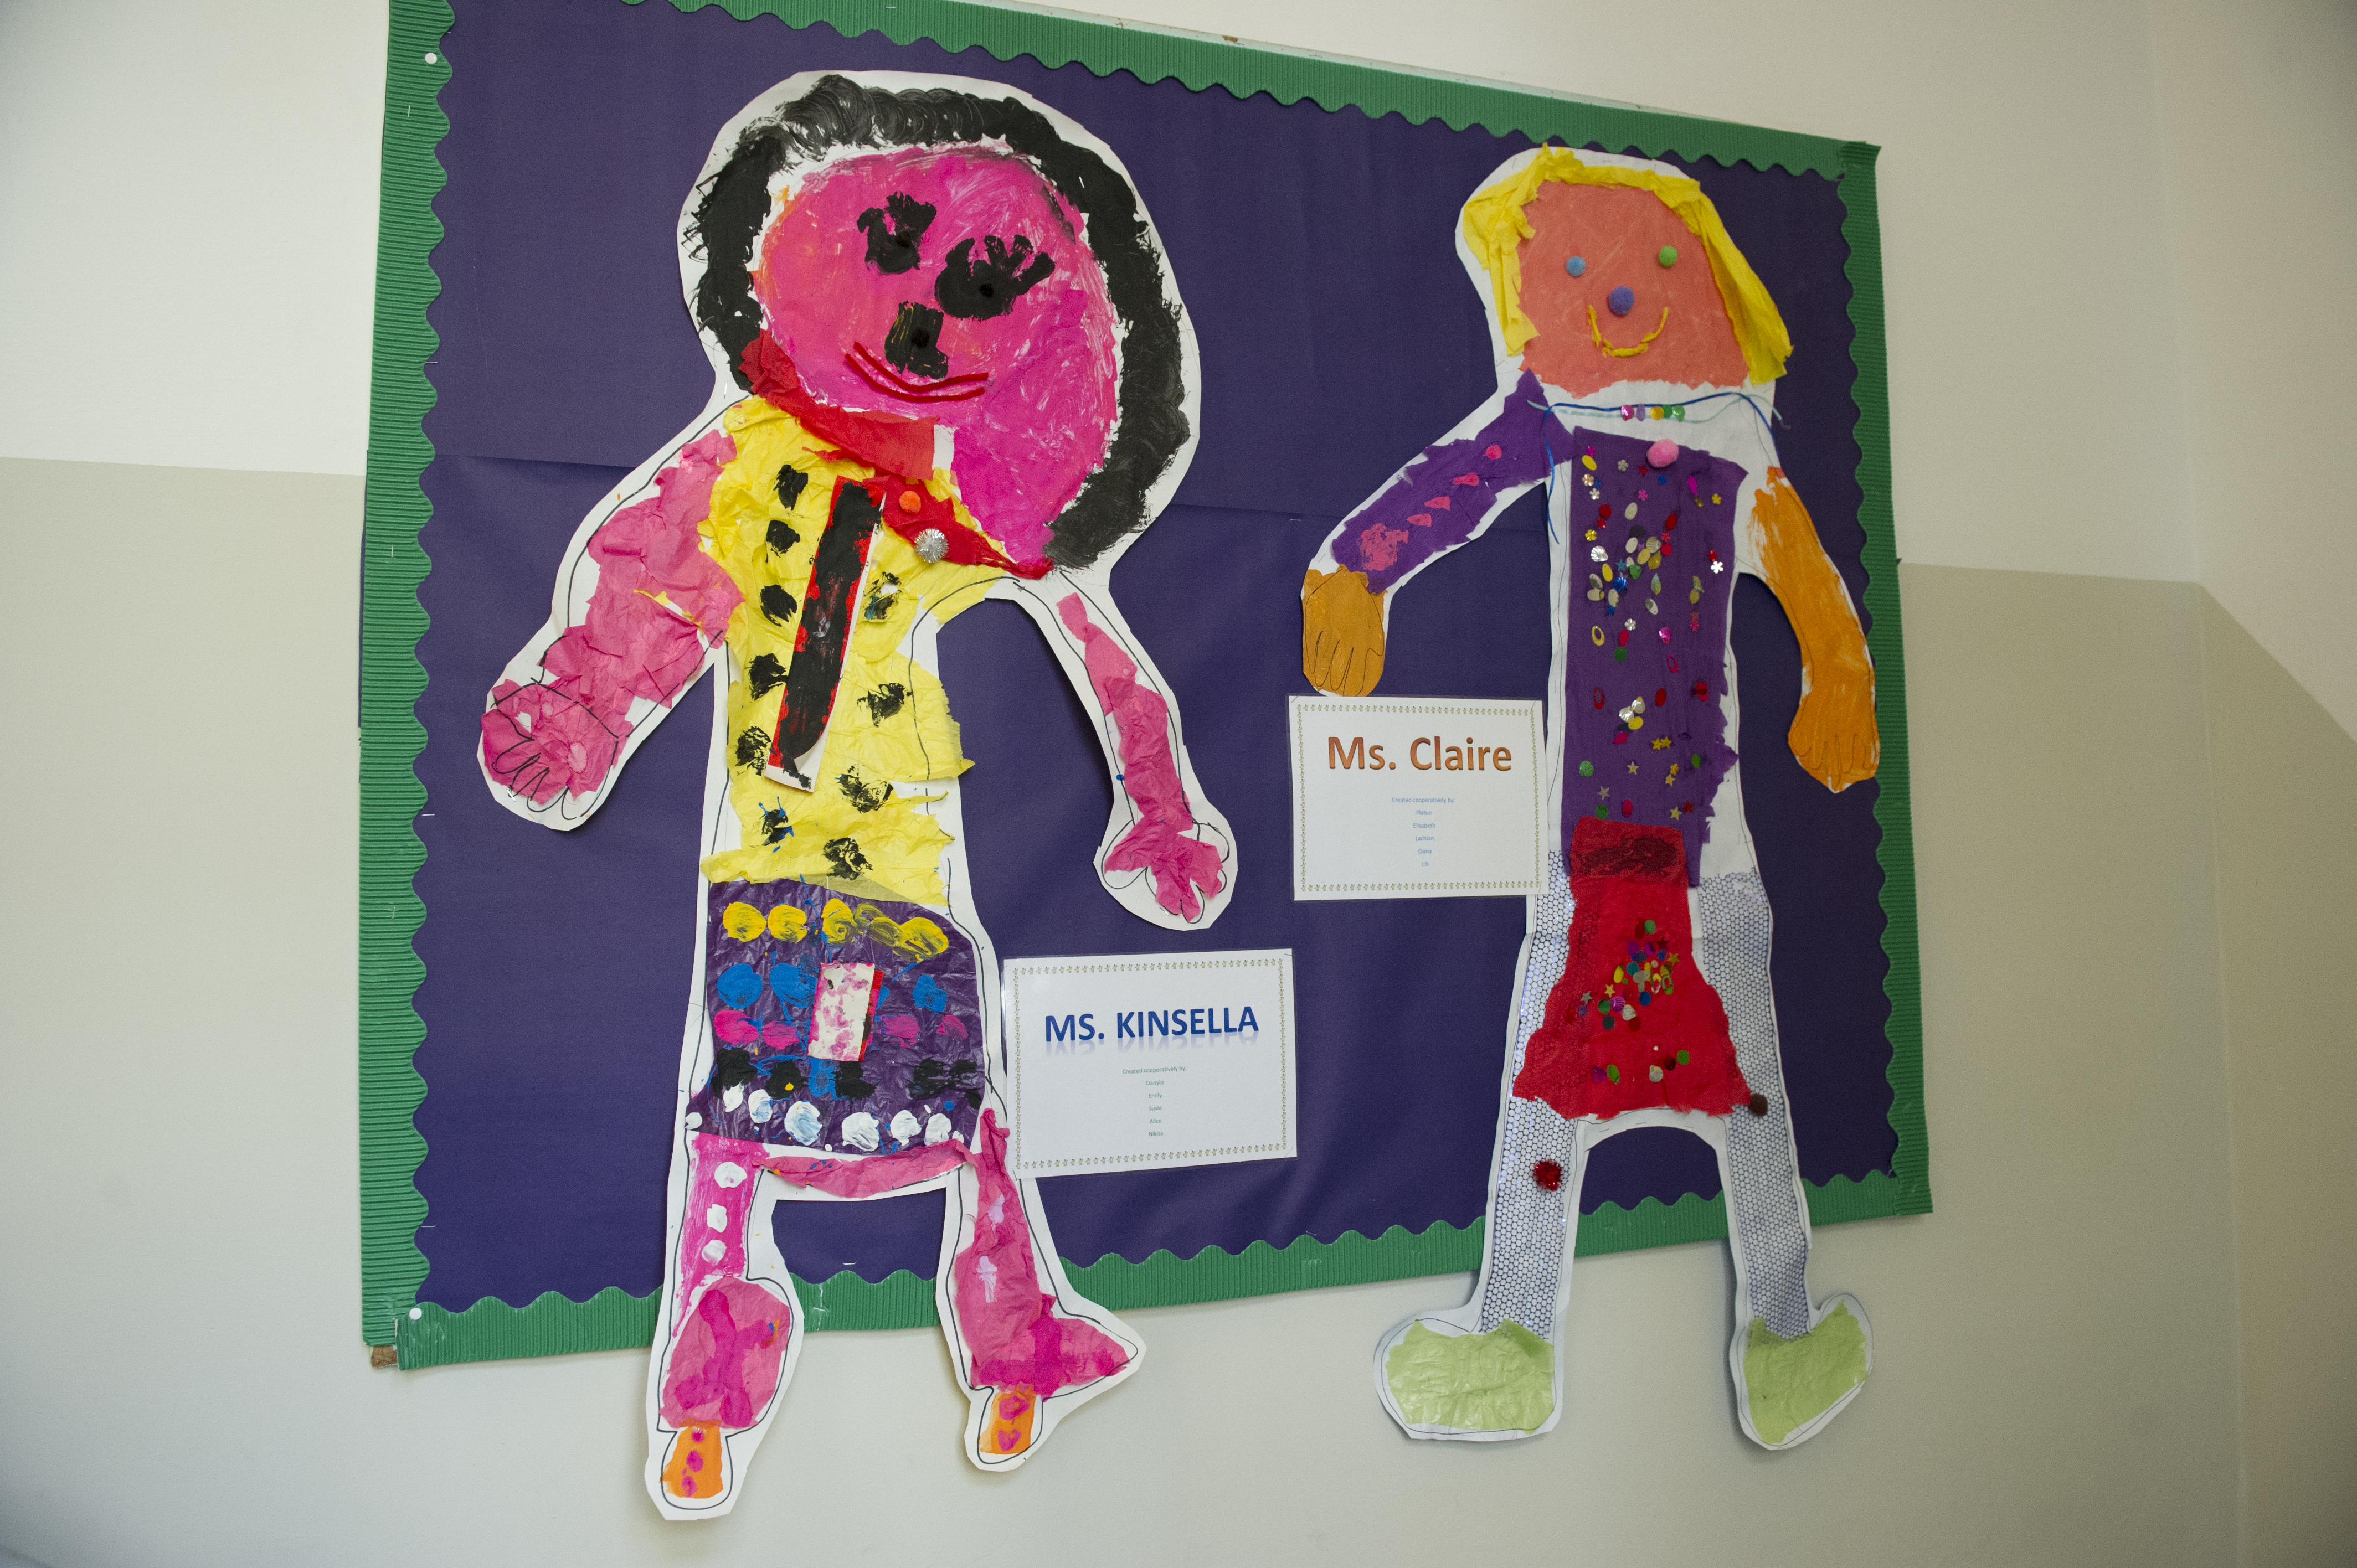 Children's impressions